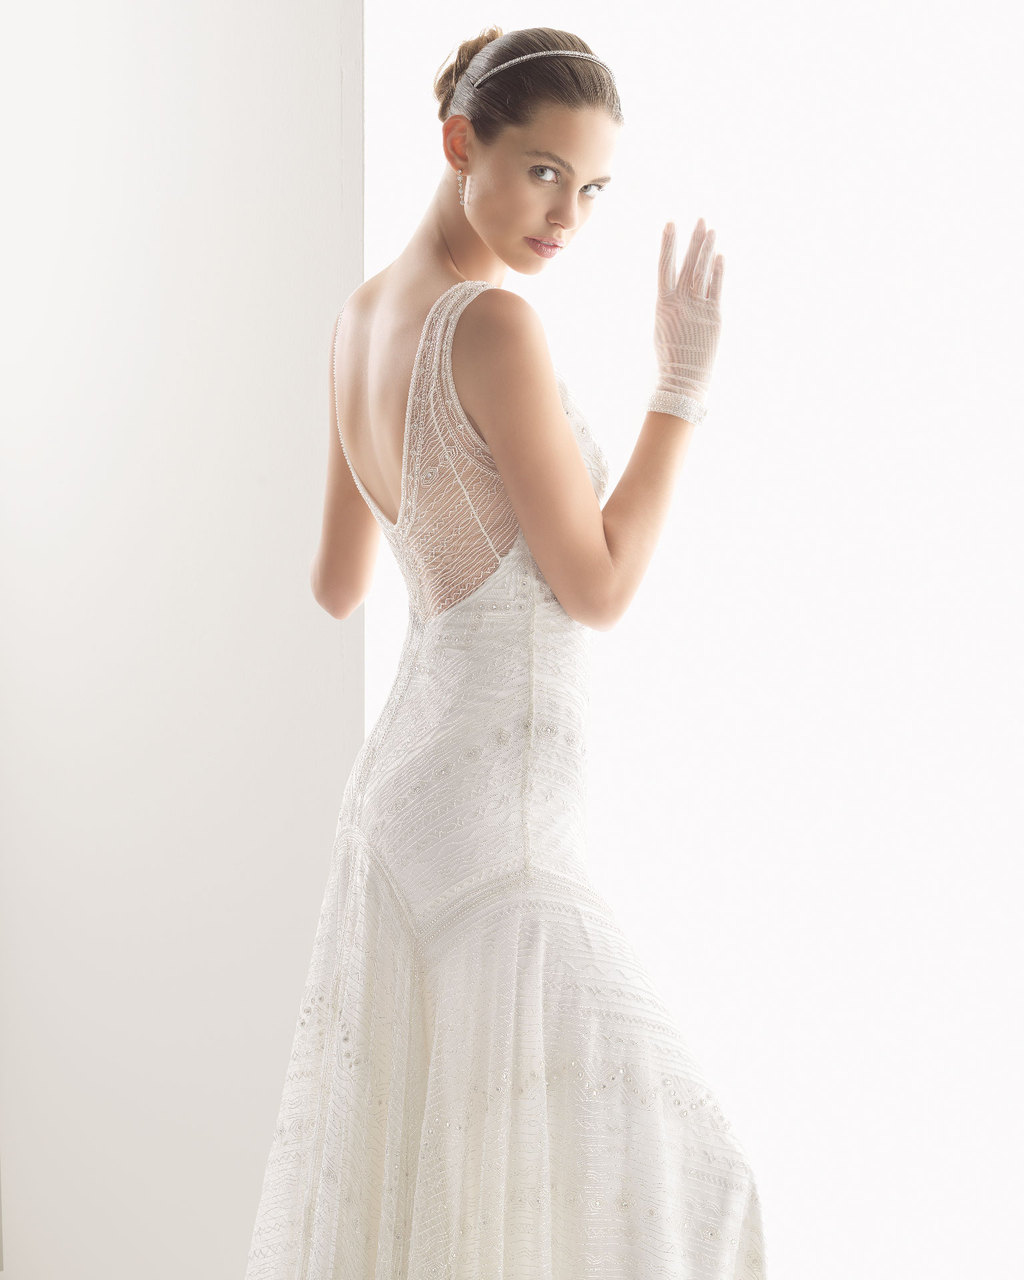 Rosa clara wedding dress 2014 bridal for Rosa clara wedding dresses 2014